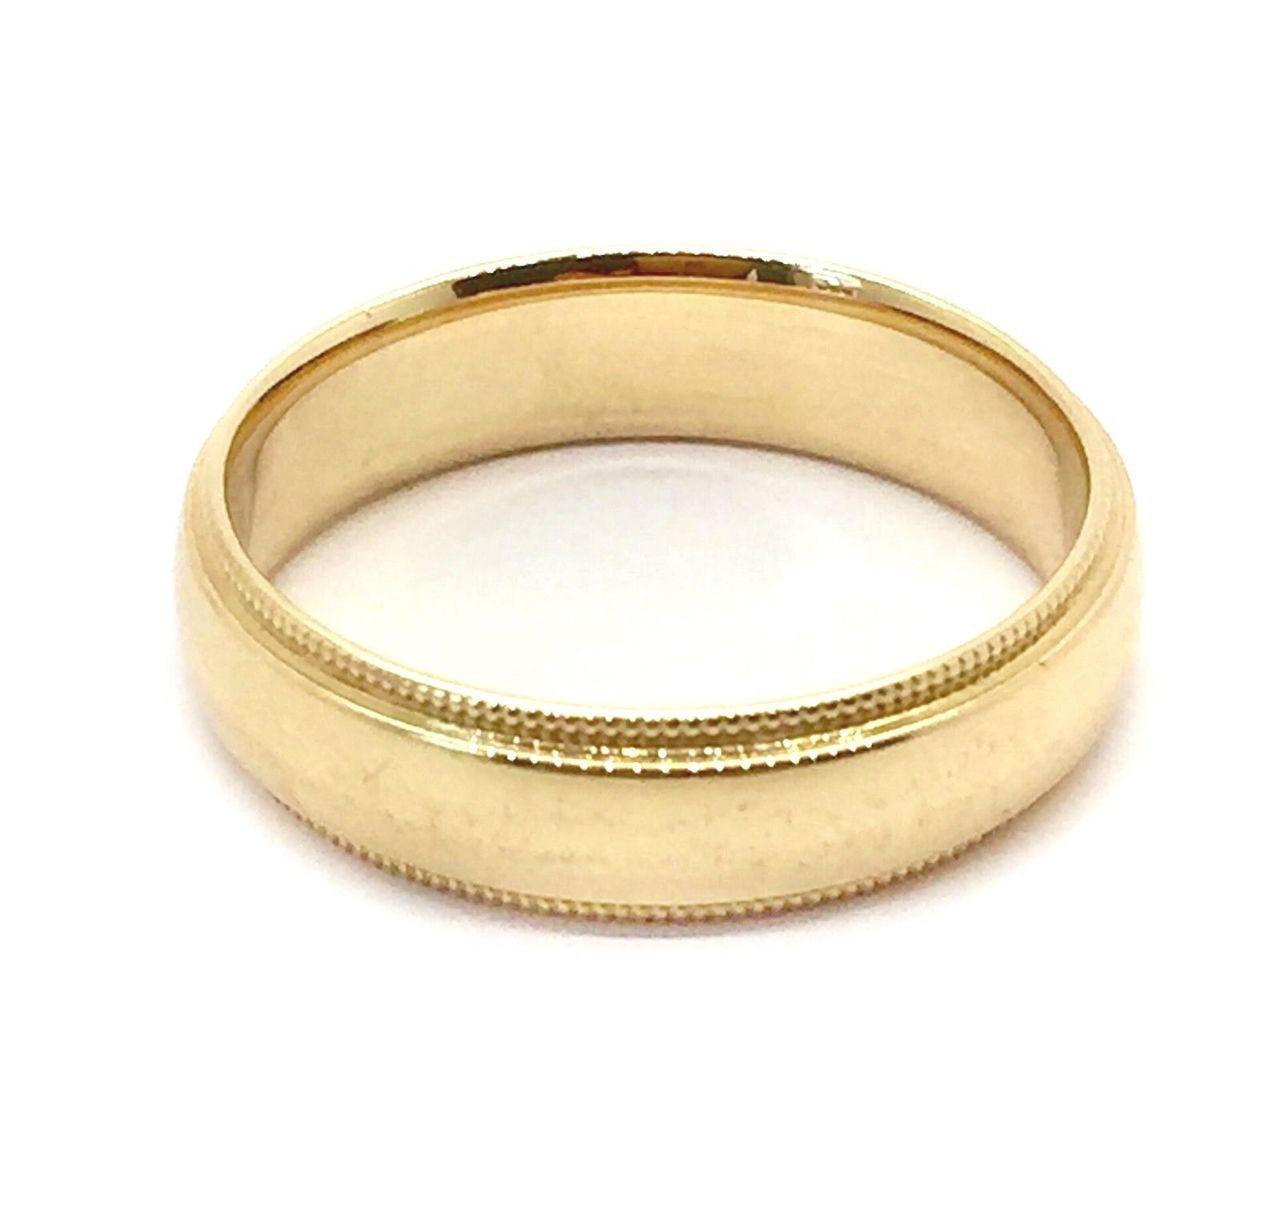 Solid 14K Yellow Gold 5 MM Size 11 Milgrain Wedding Ring Band Mens ...